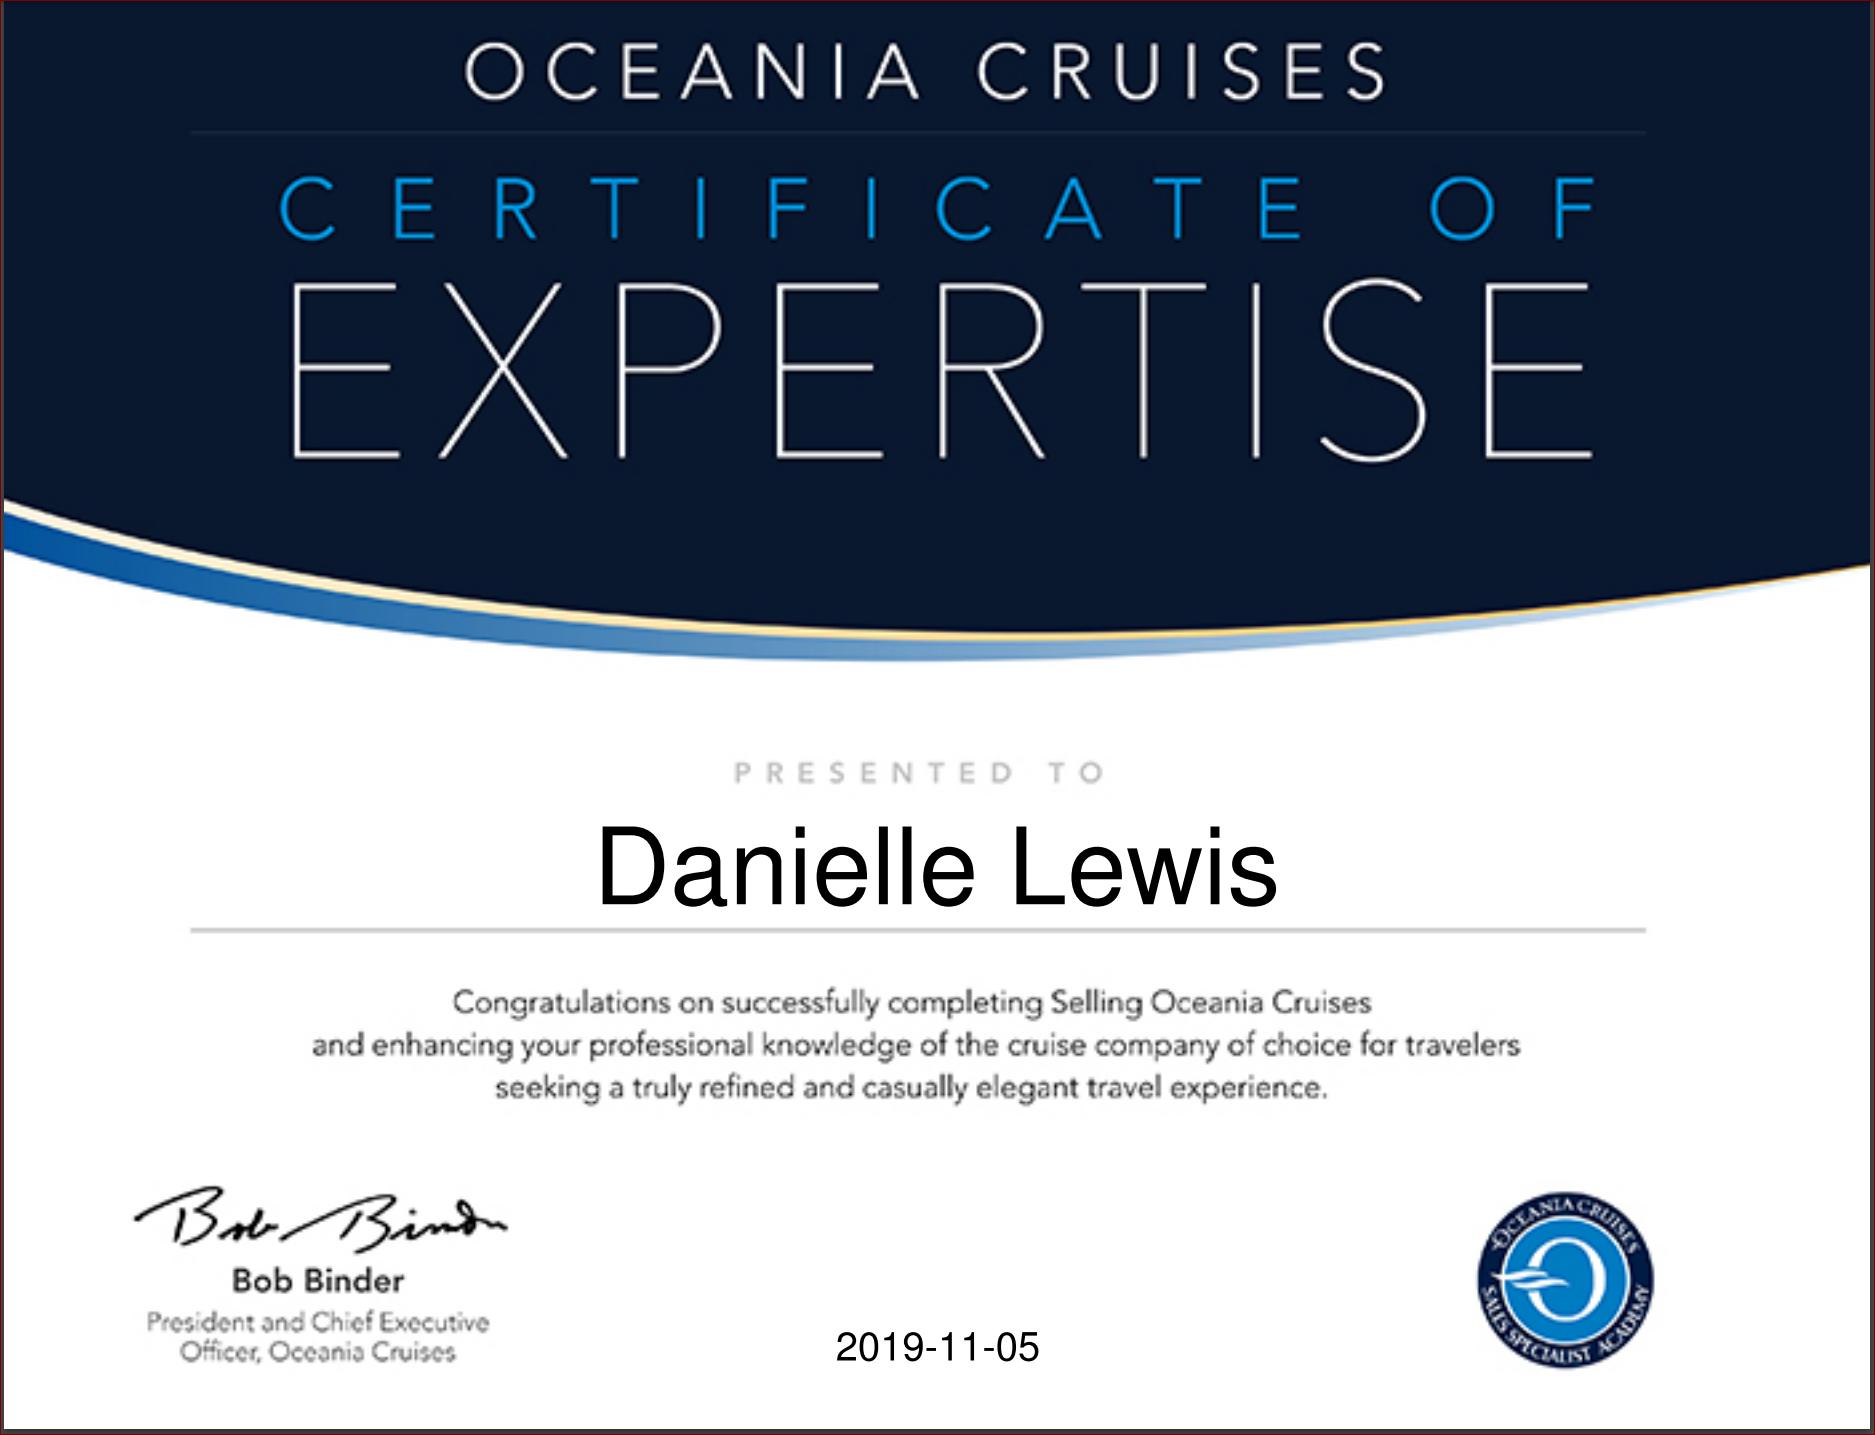 SelfishMe Travel - Oceania Cruises - Selling Certificate of Expertise